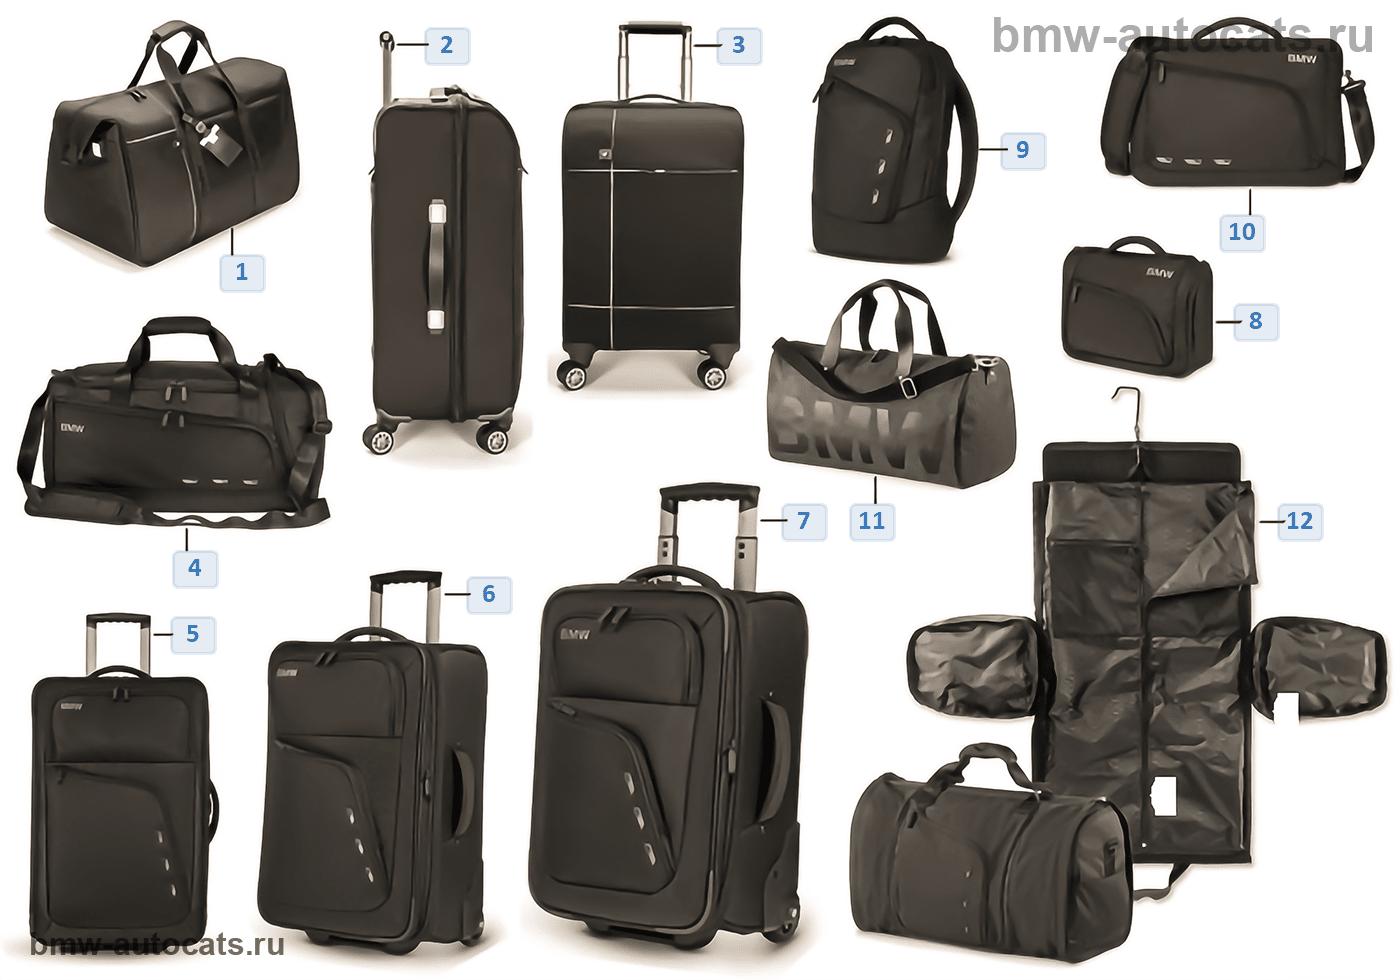 BMW Coll. — багаж 2014-16, 2016-18